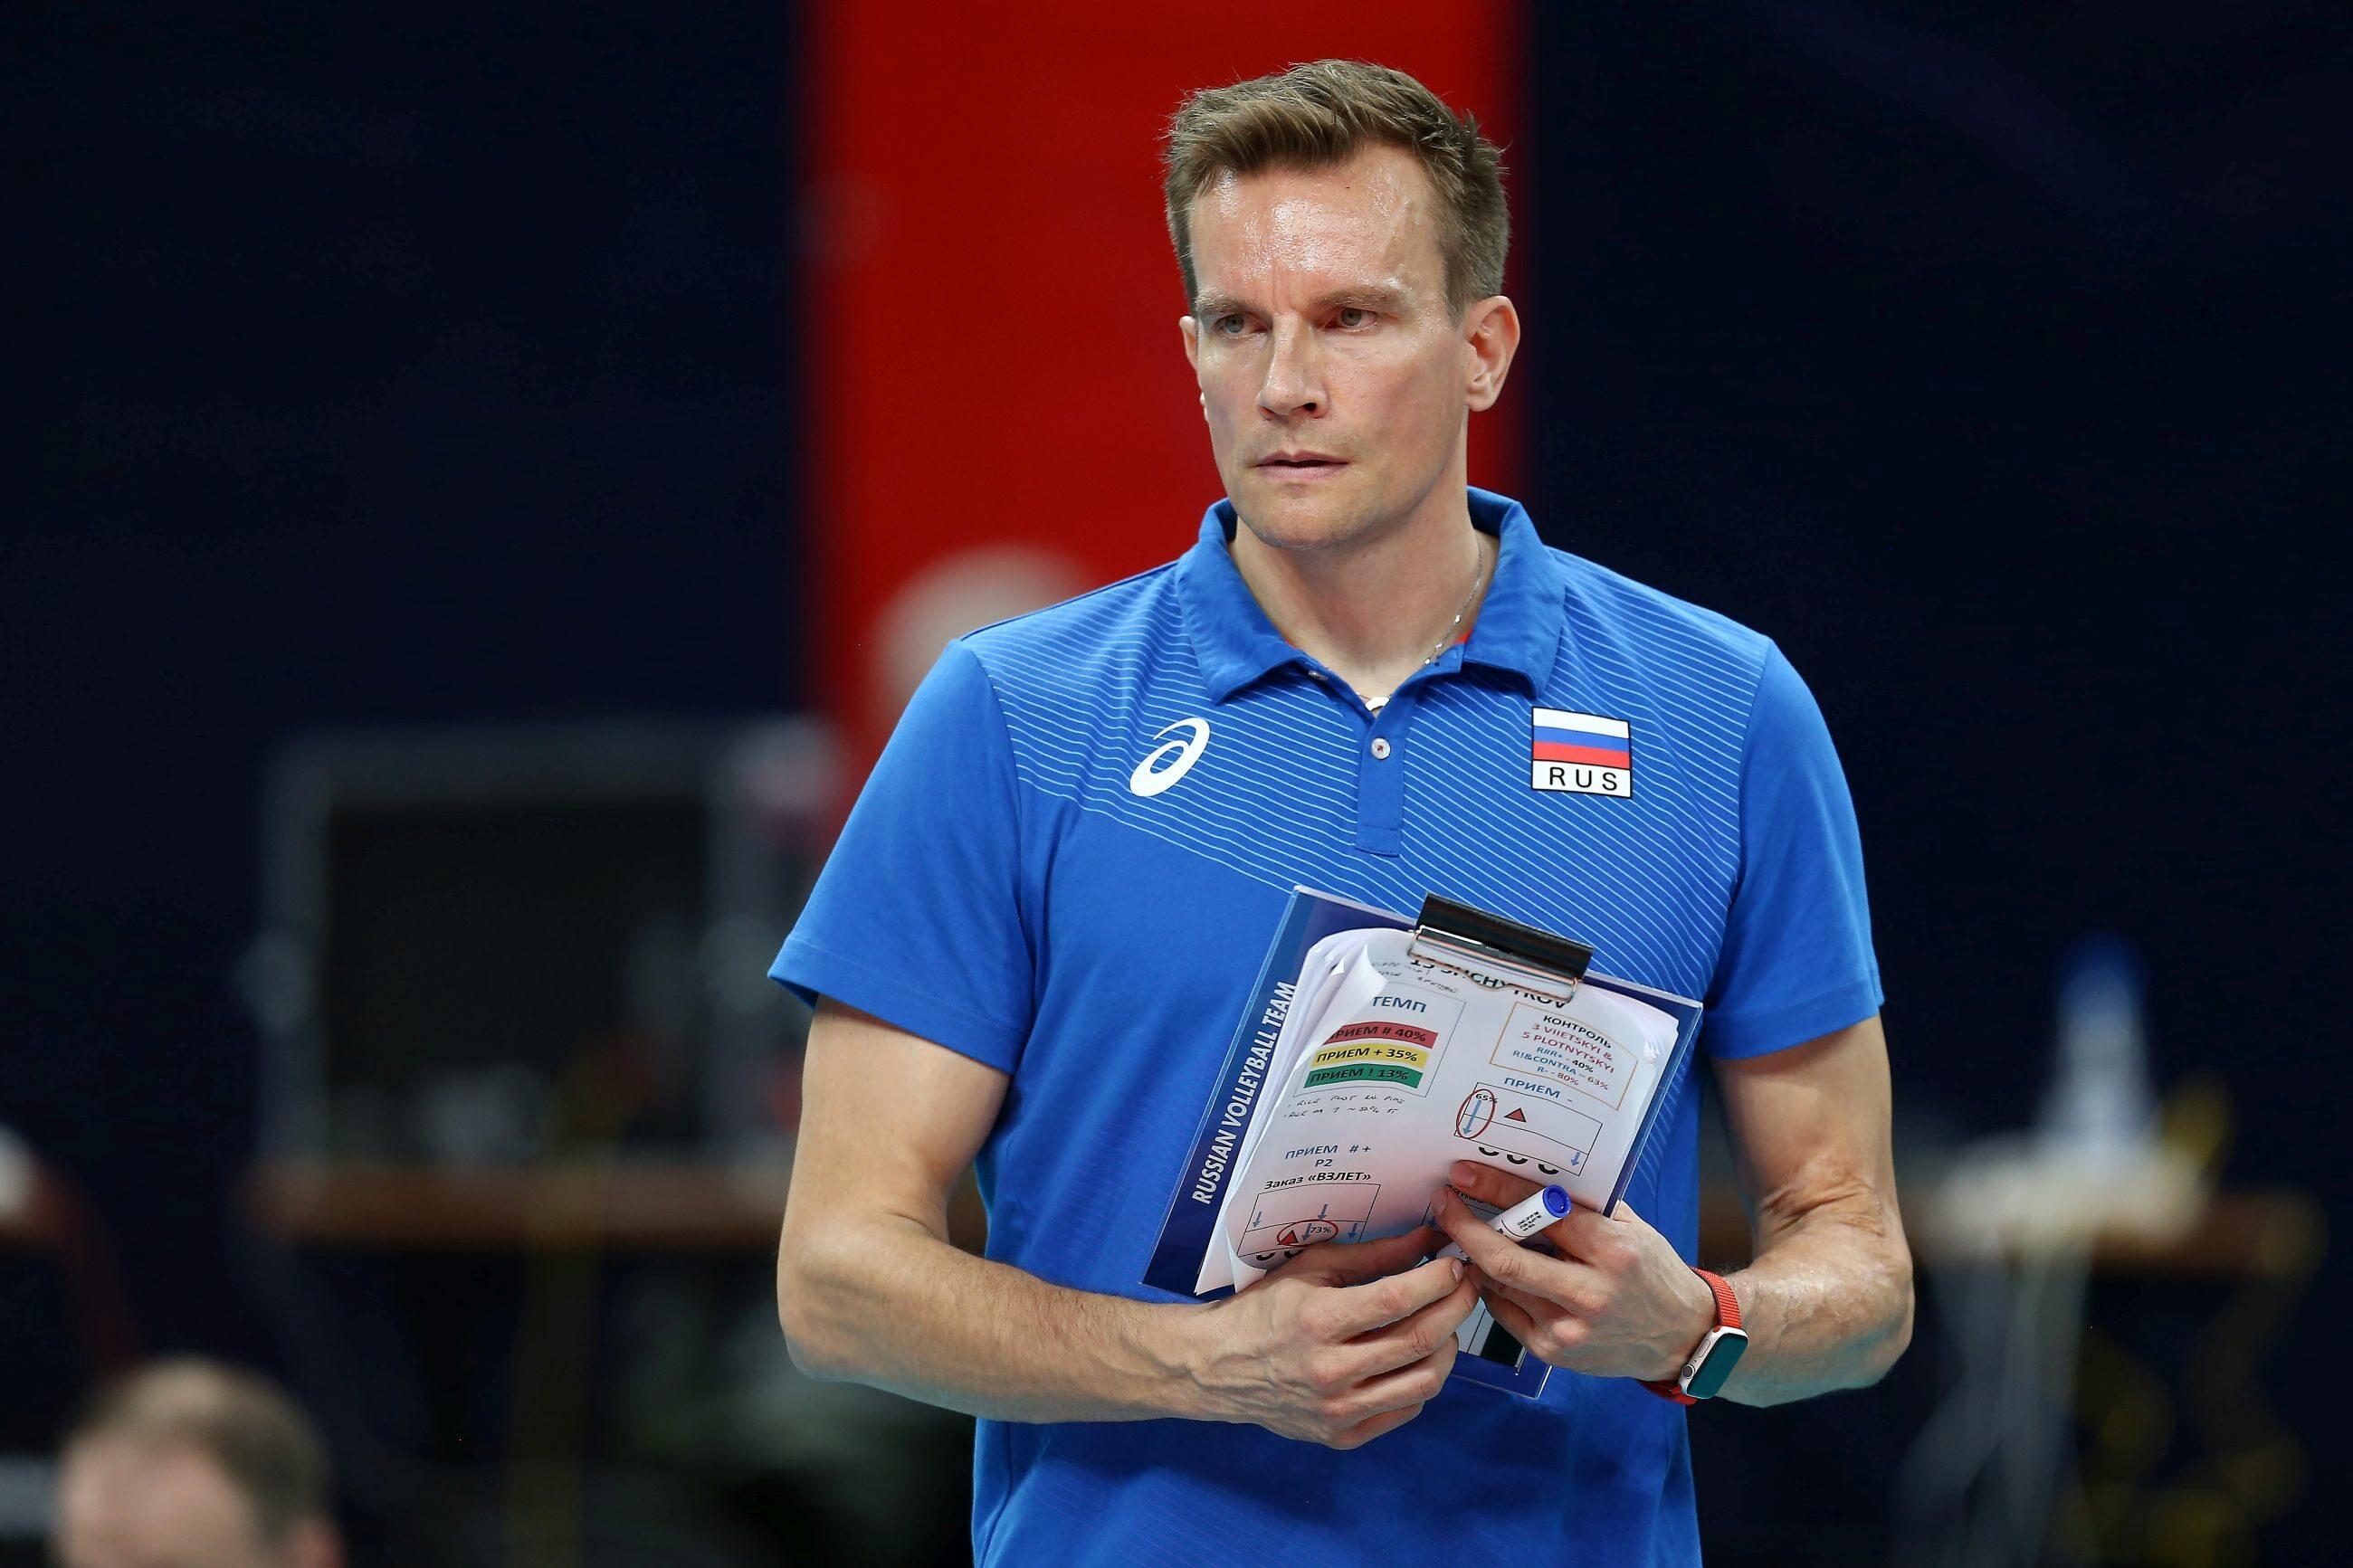 ME w siatkówce. Polska – Rosja. Trener Tuomas Sammelvuo komentuje